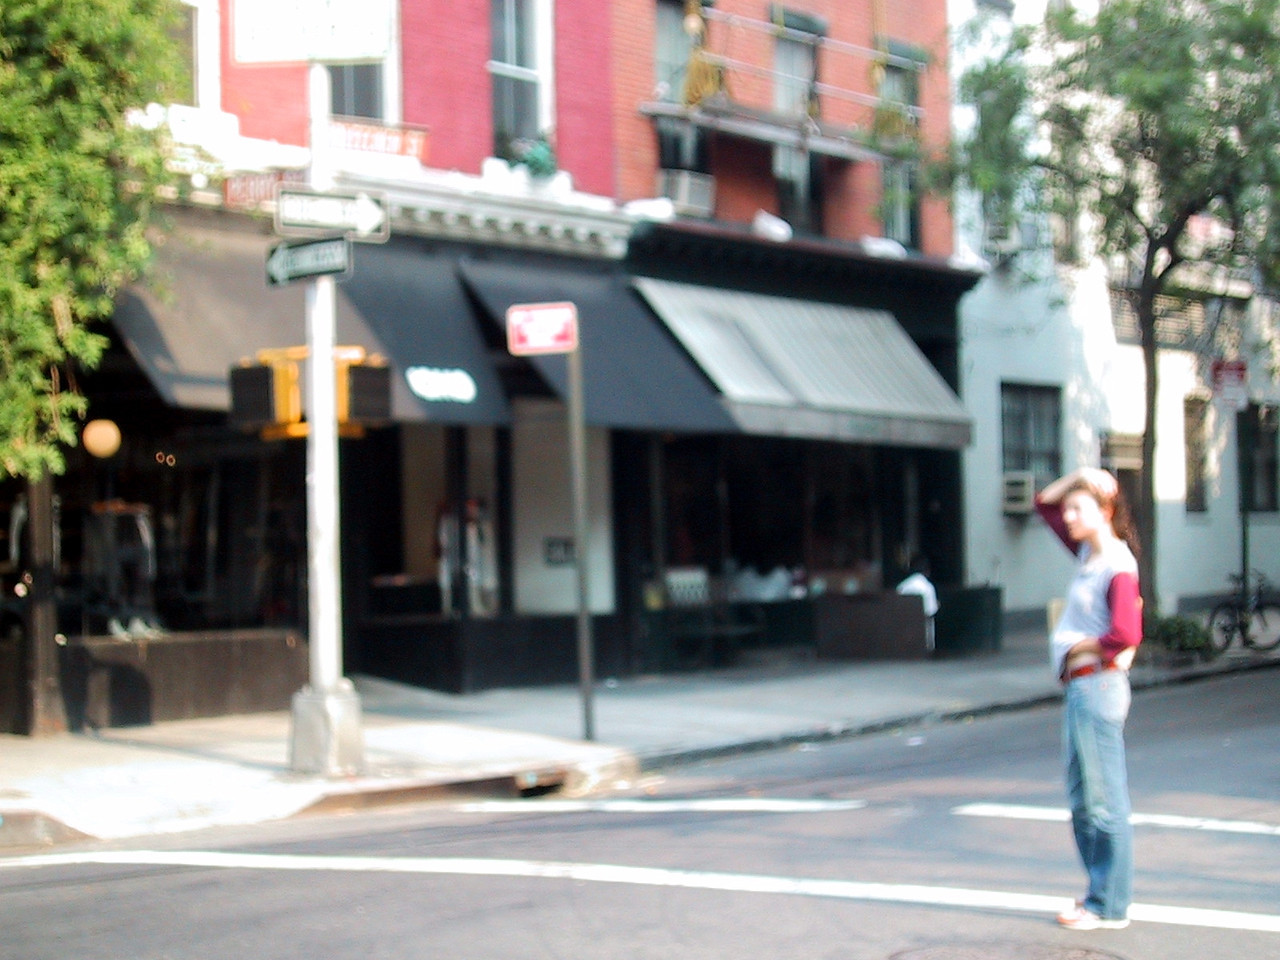 NYC, July 2002